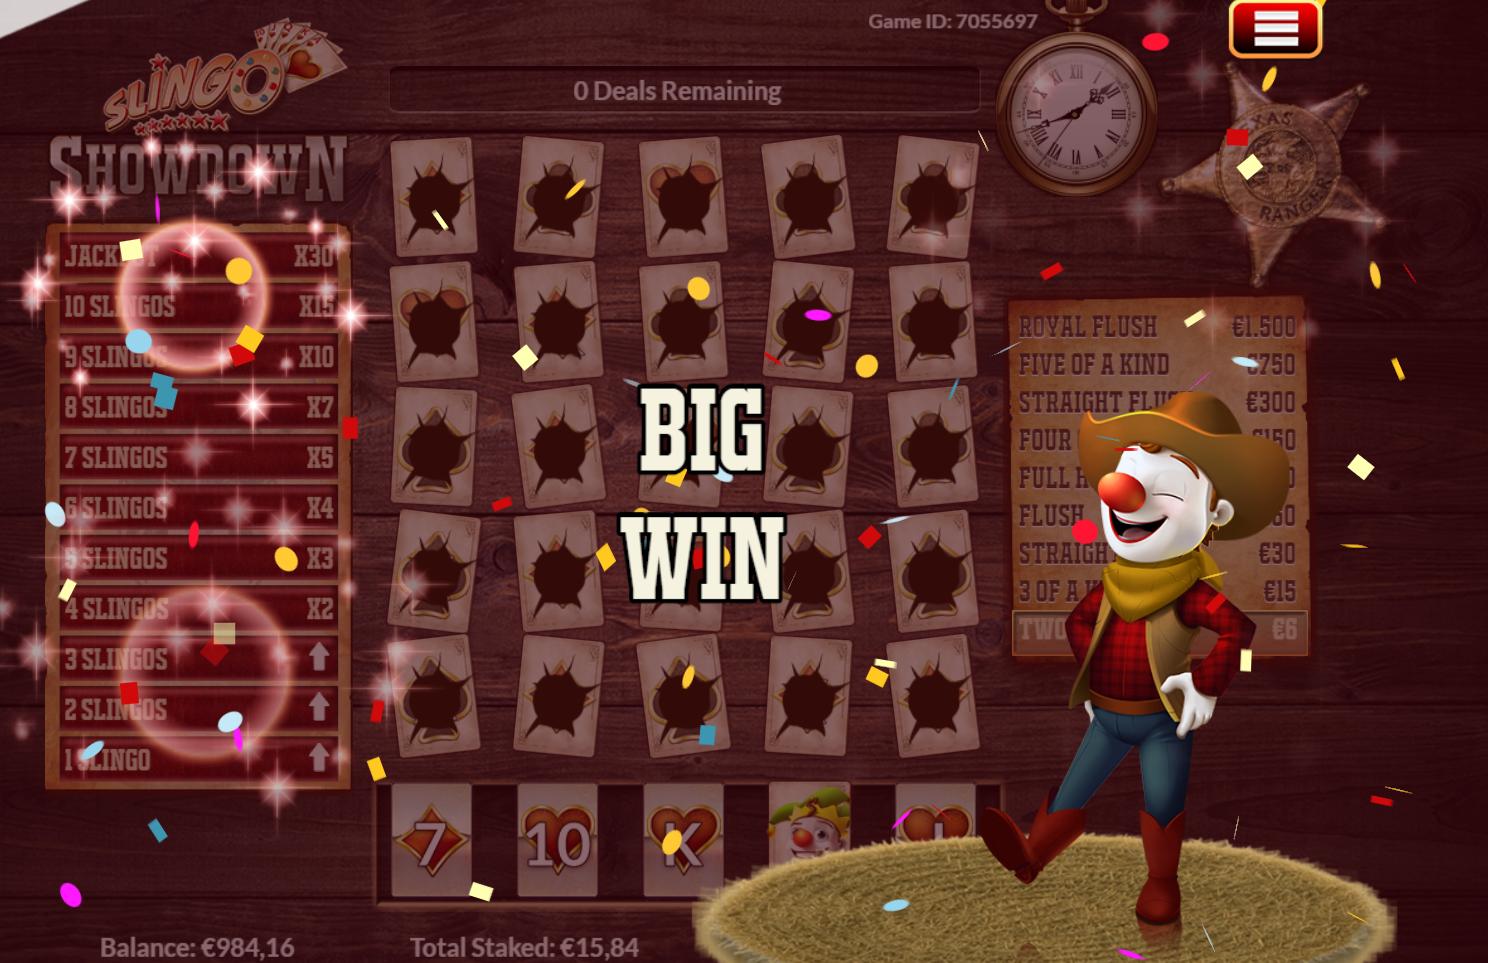 permainan kasino slingo menang besar rumah penuh